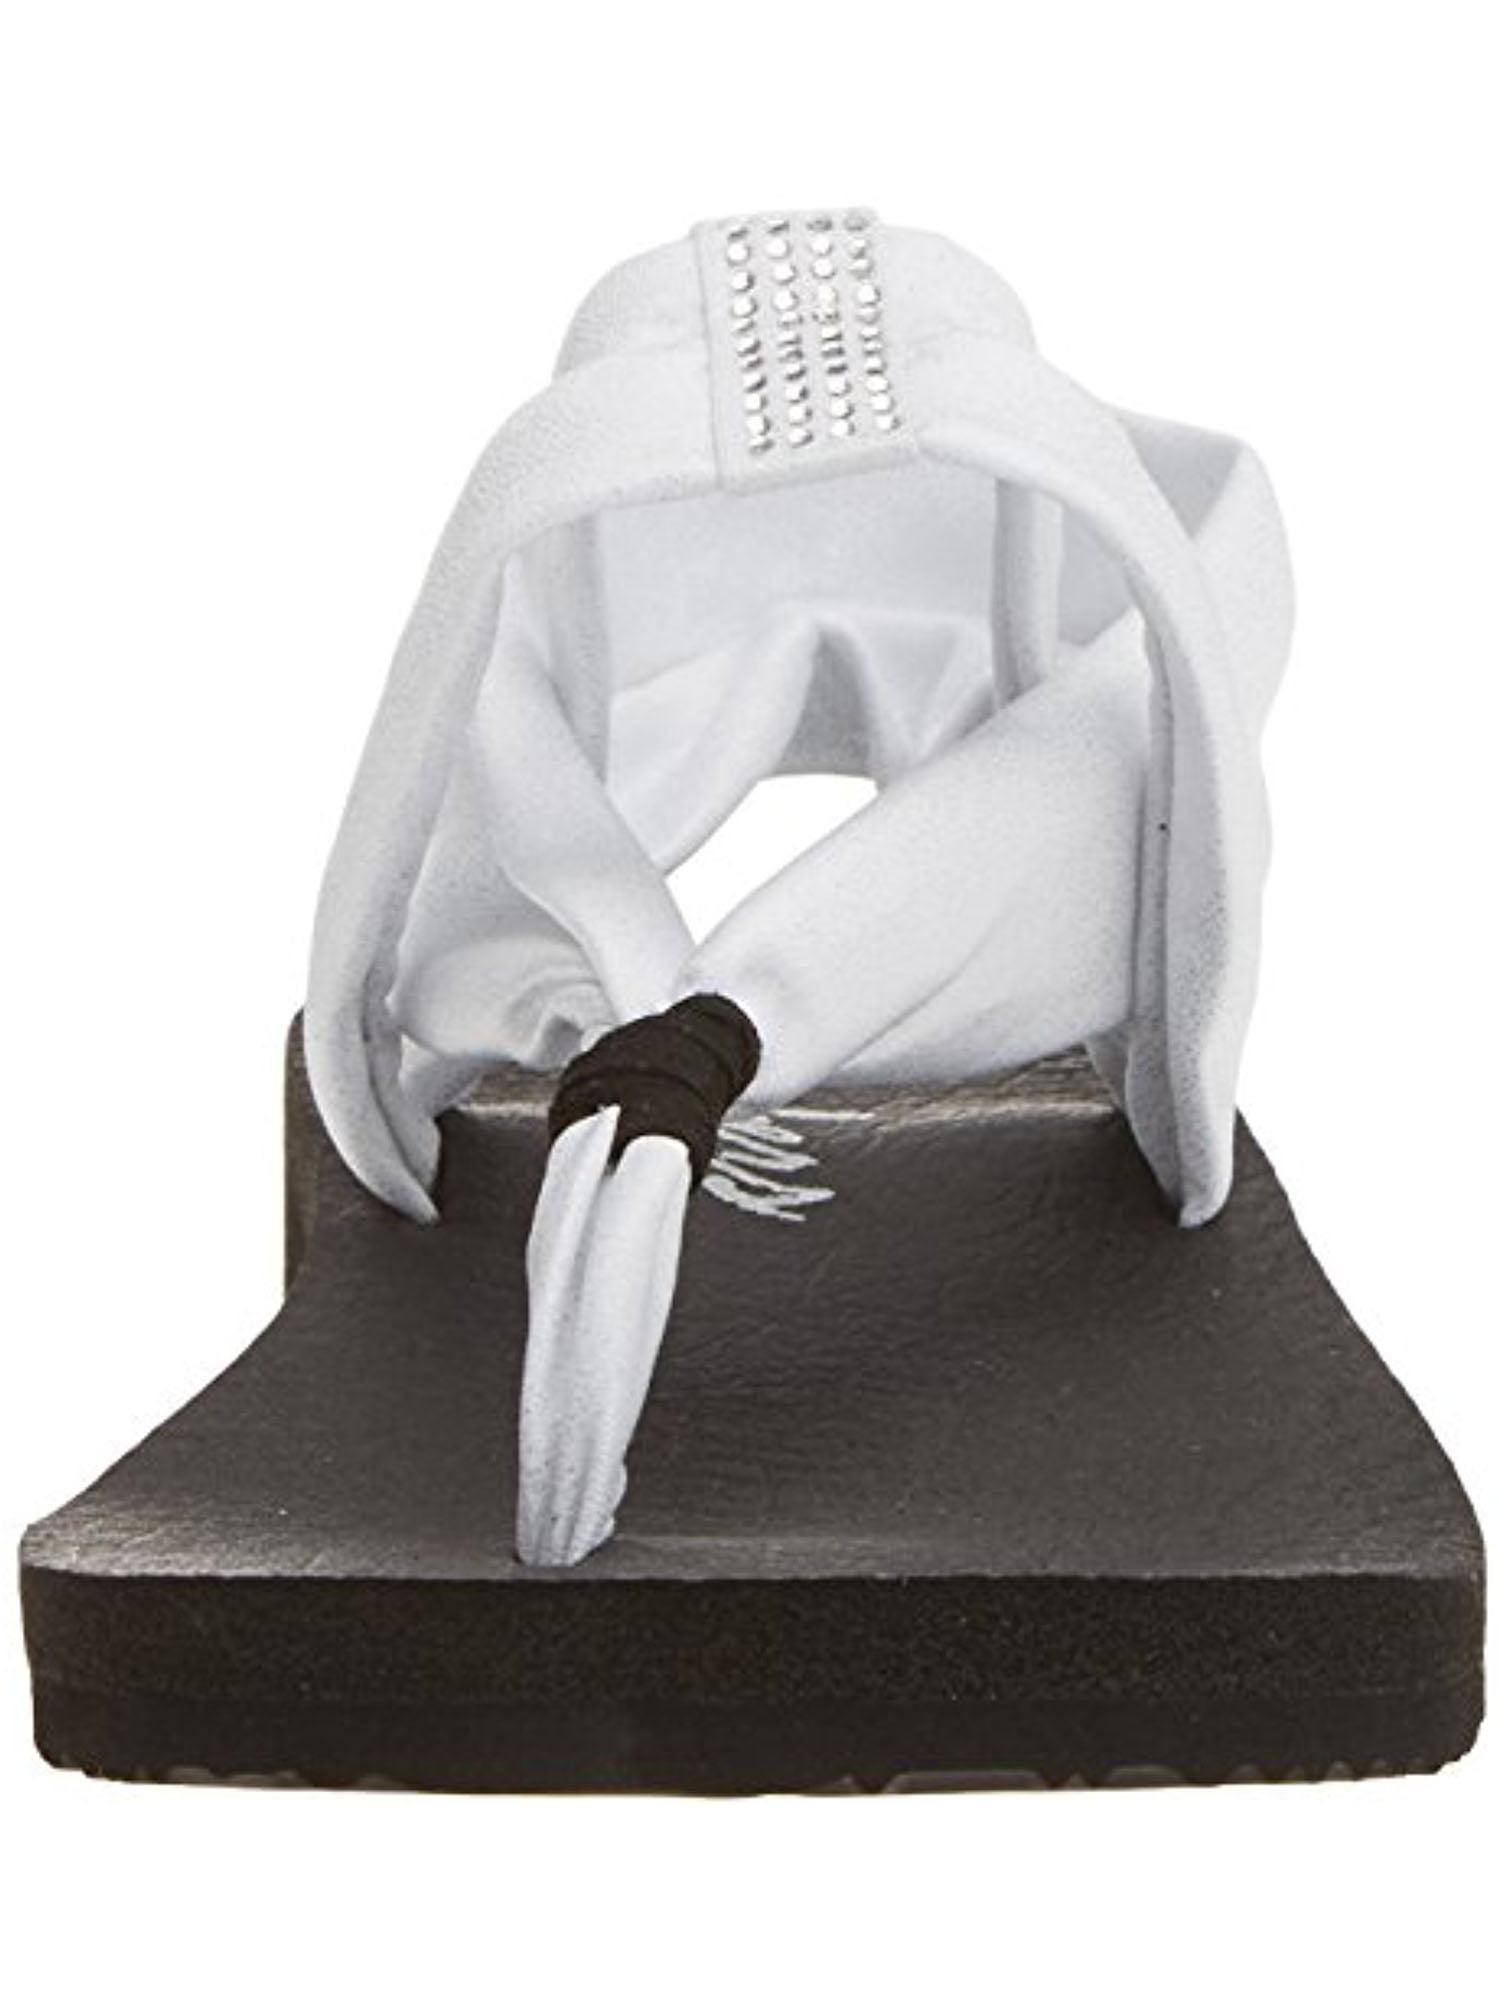 4e68546586f1 SKECHERS - skechers 38634WSL Women s MEDITATION - DISCO Casual Shoes -  Walmart.com